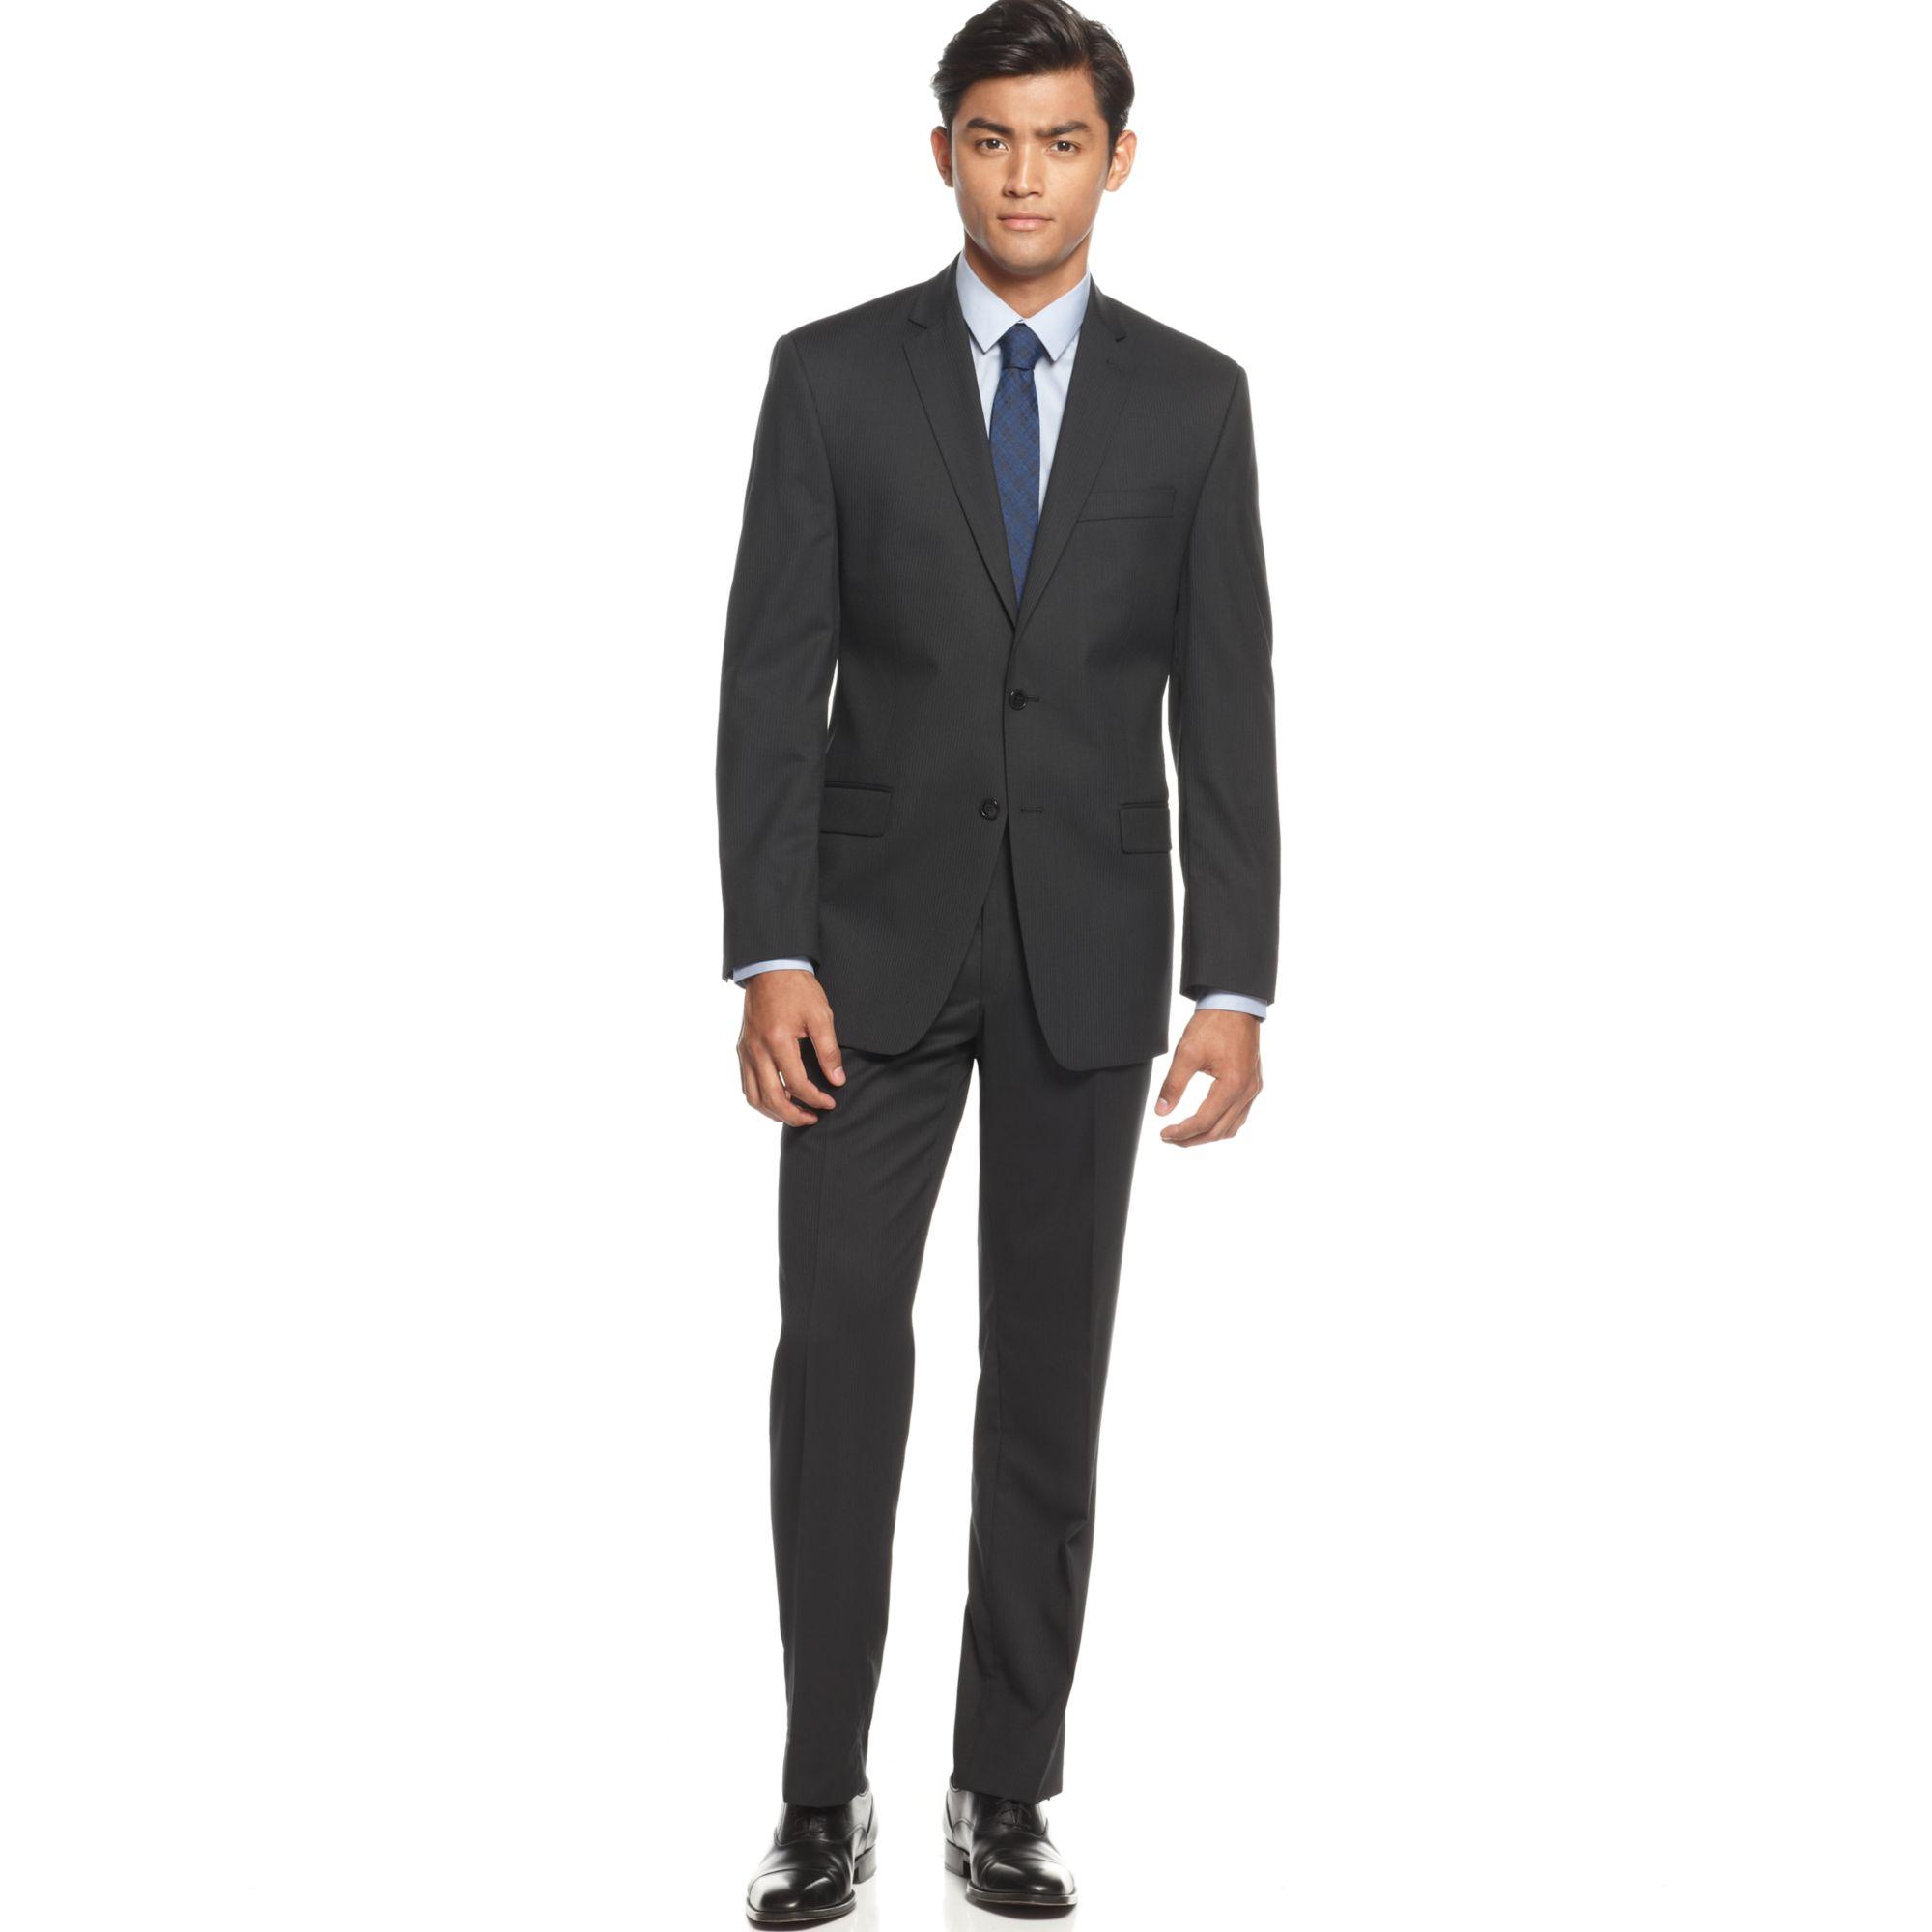 Calvin klein Black Tonal Striped Slim-Fit Suit in Black ...